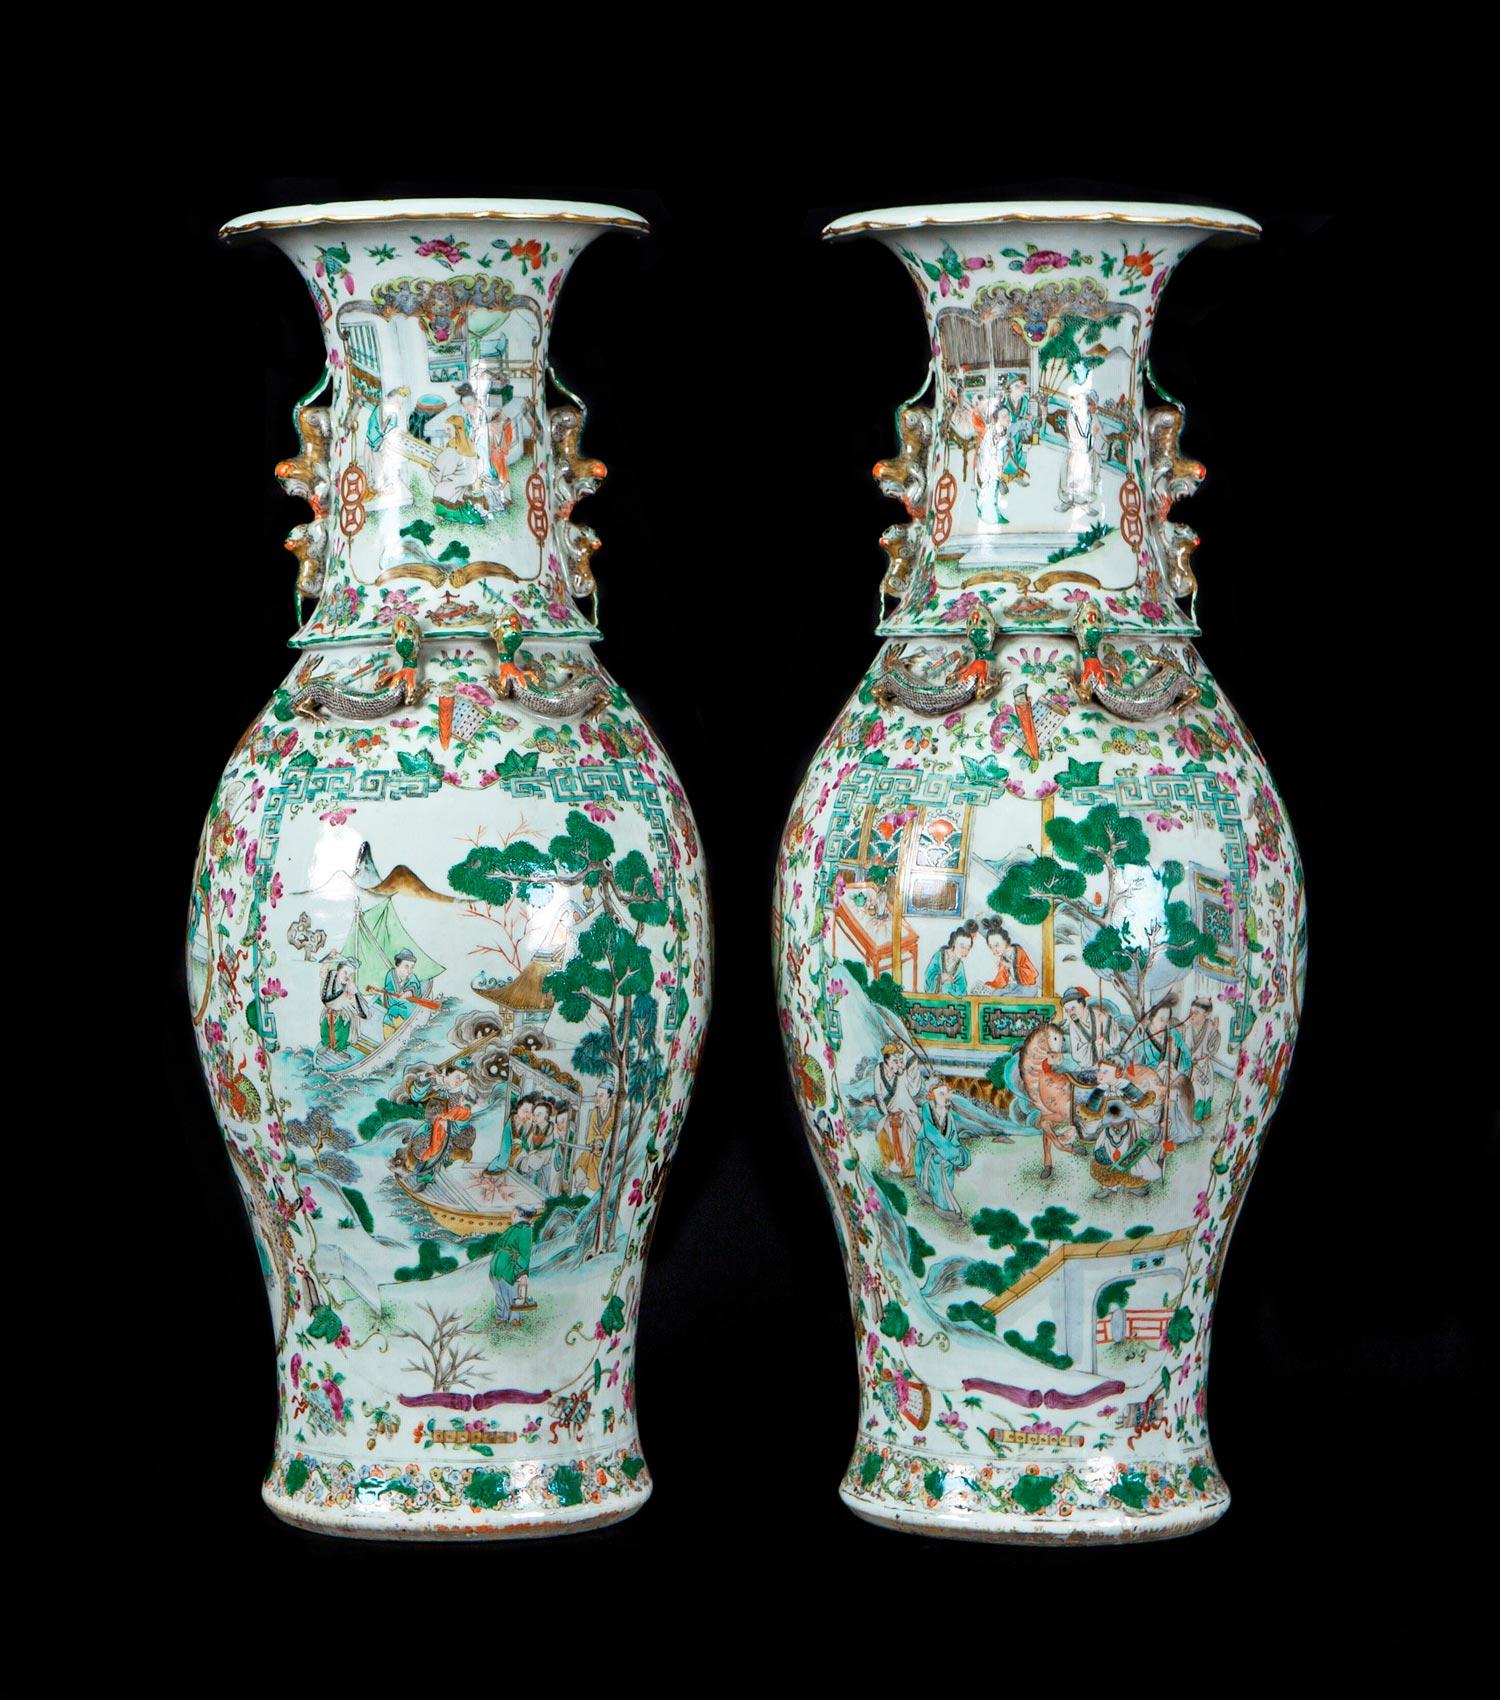 305-pareja-de-jarrones-monumentales-en-porcelana-esmaltada-china-dinasta-qing-s.xix_.00a